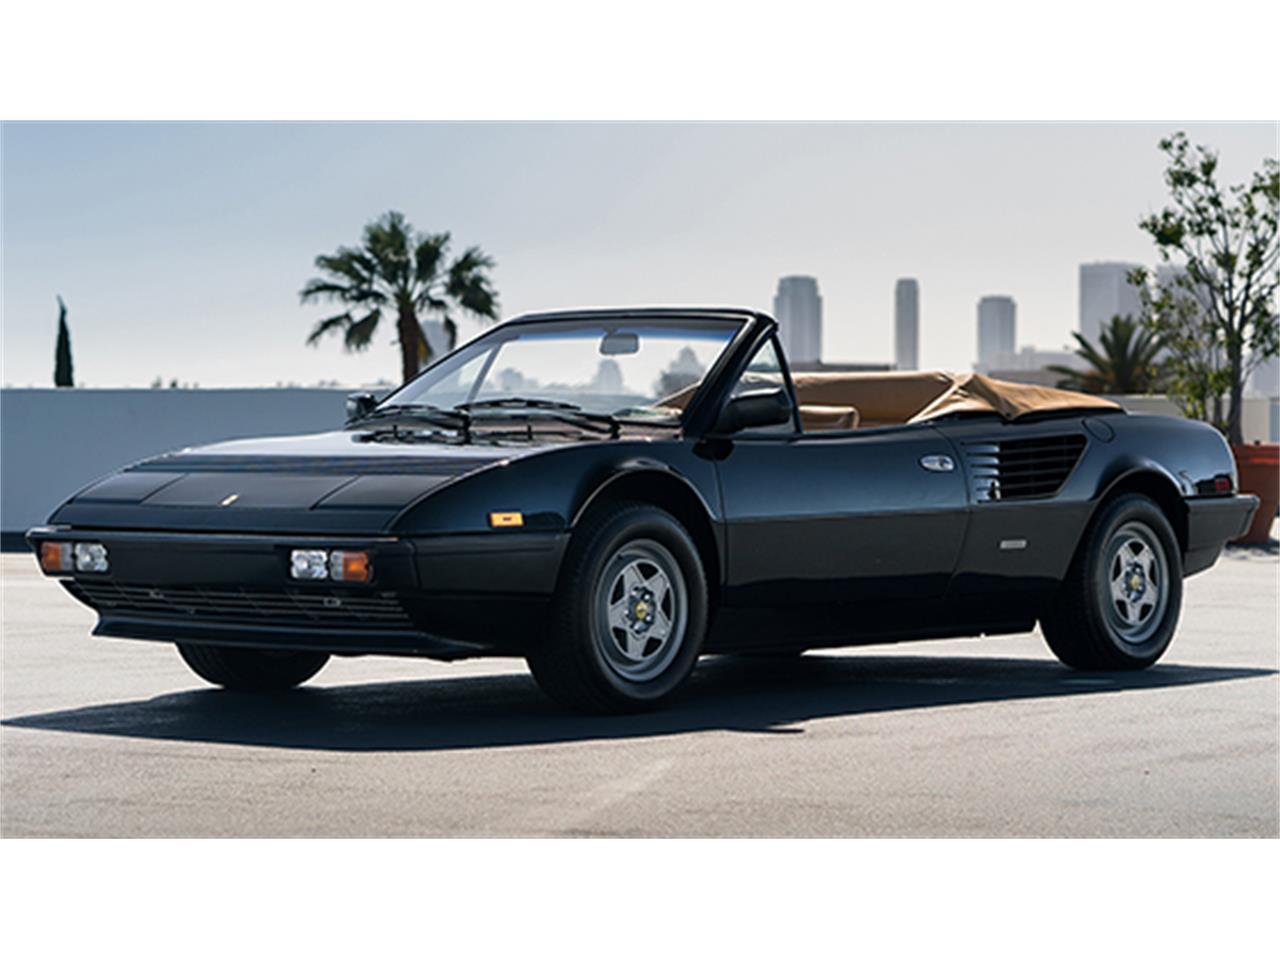 1985 ferrari mondial for sale | classiccars | cc-1111913